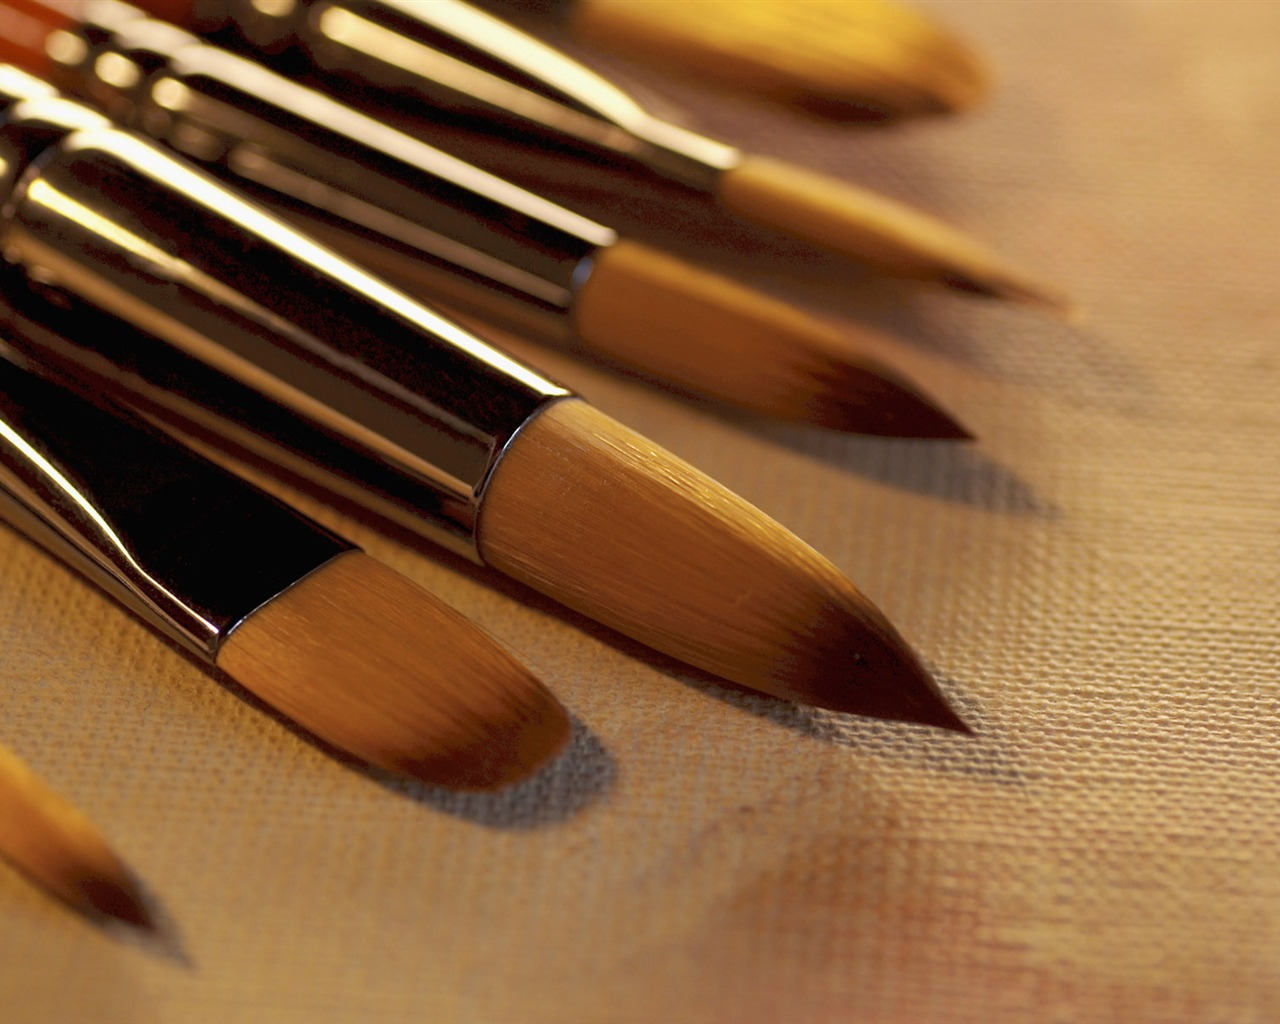 Ipad Retina Wallpaper Art Pain Brush: Colorful Wallpaper Paint Brushes (2) #17